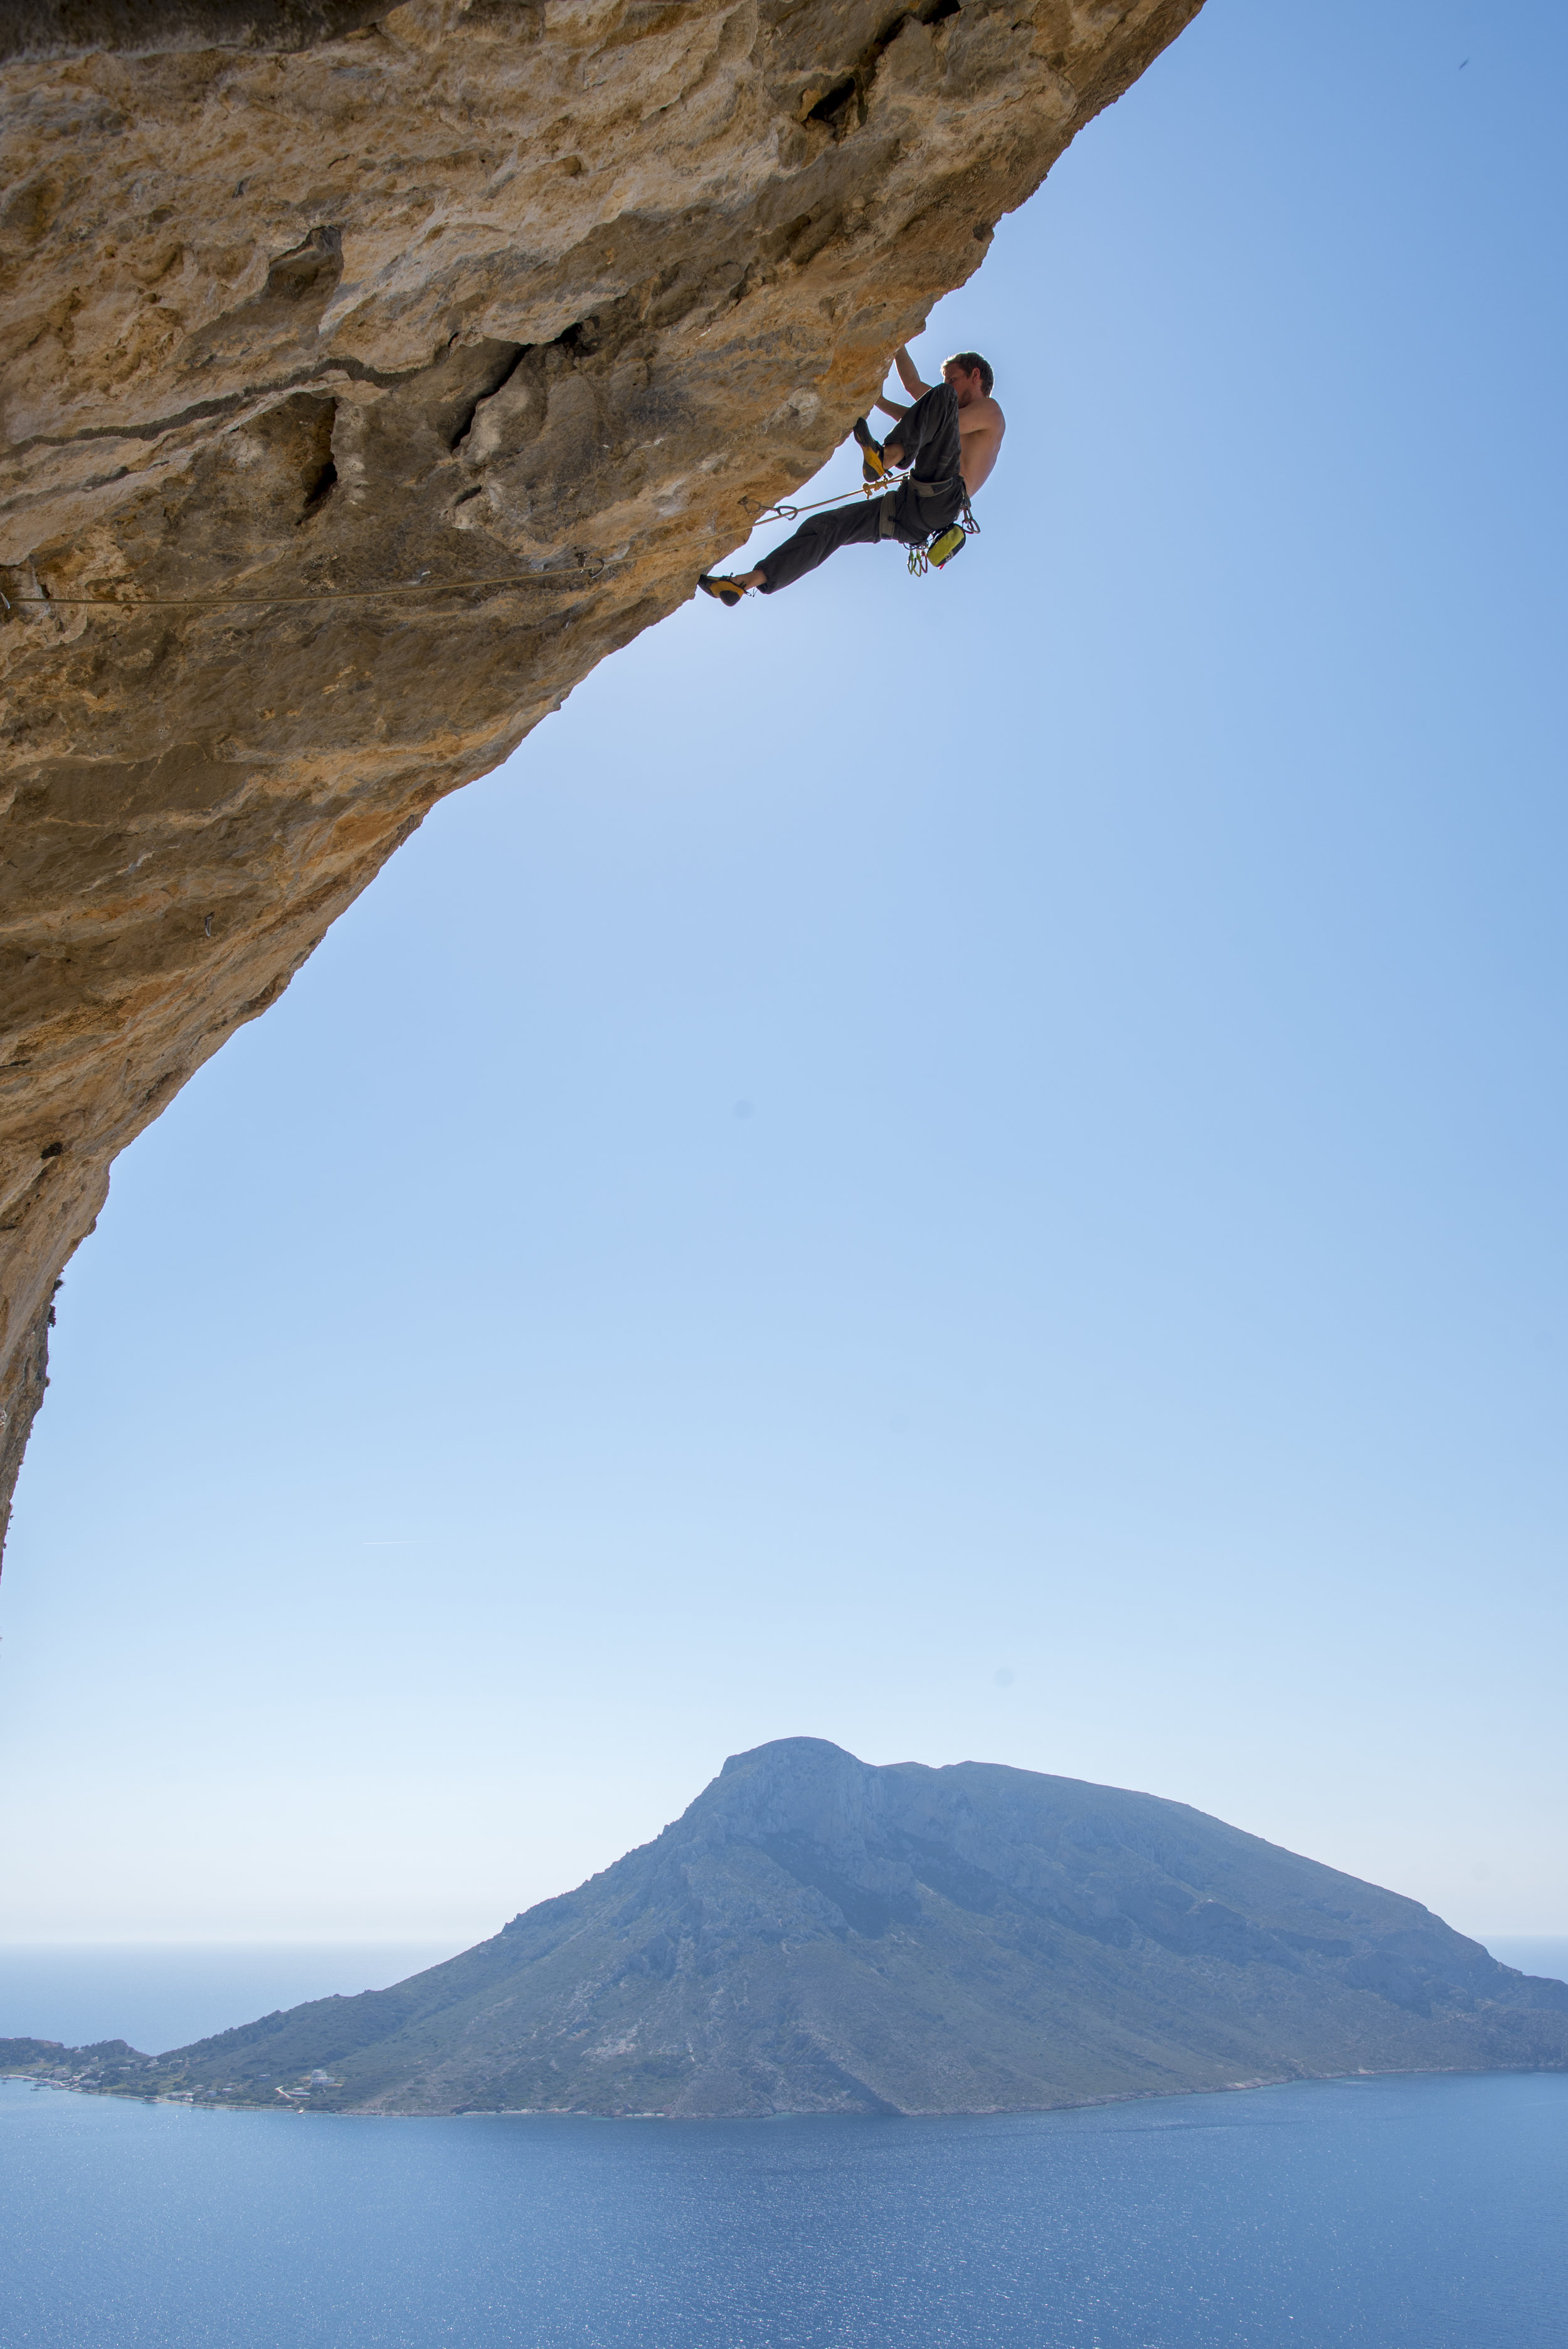 Orion 7c+ in Kalymnos, Greece  Climbing, adventure